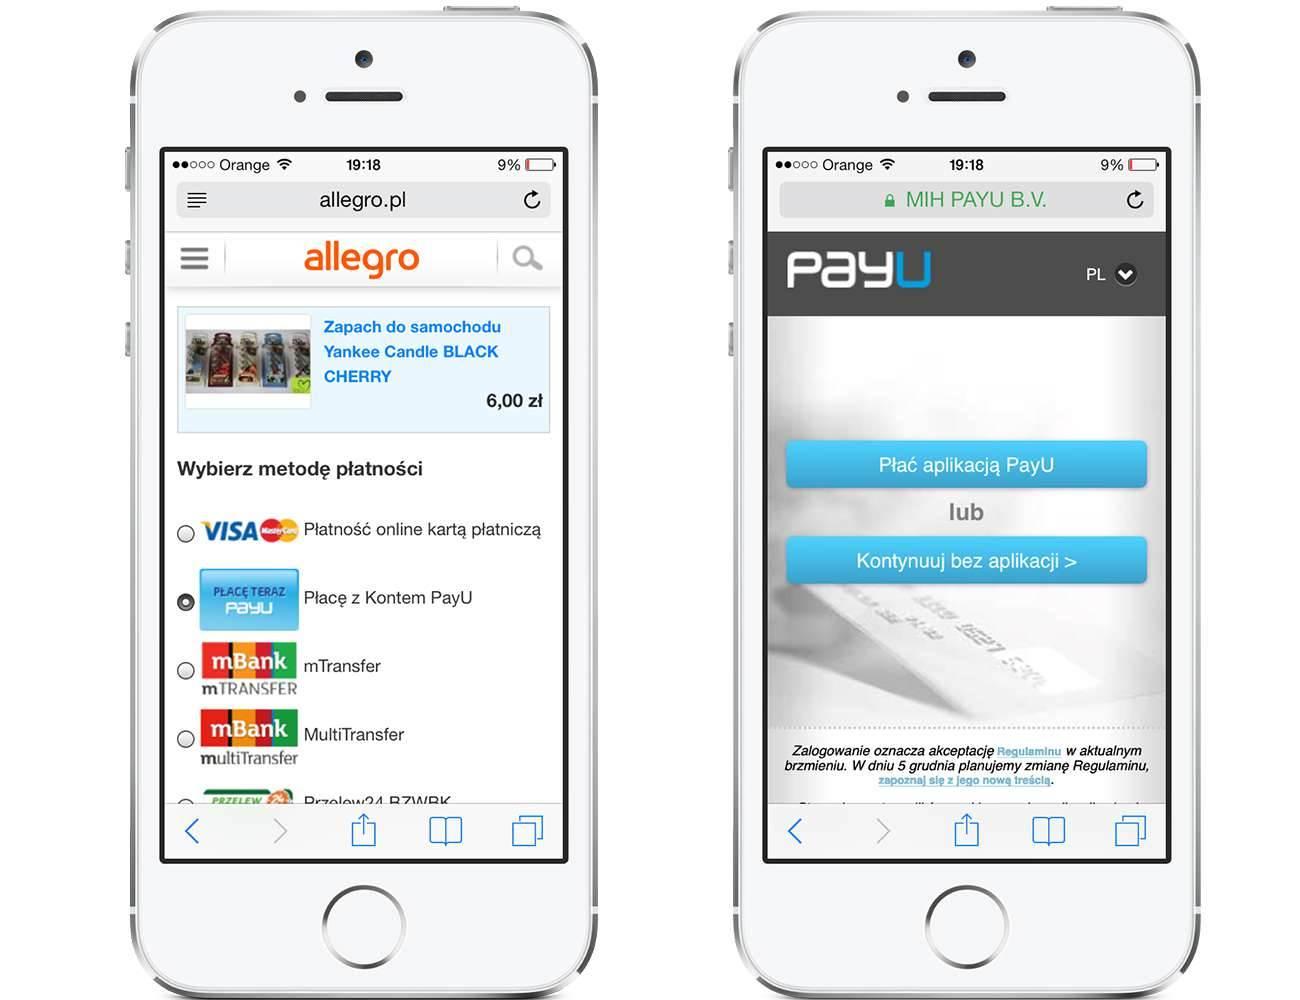 Allegro Payu I Szybkie Platnosci Prosto Z Iphone Onetech